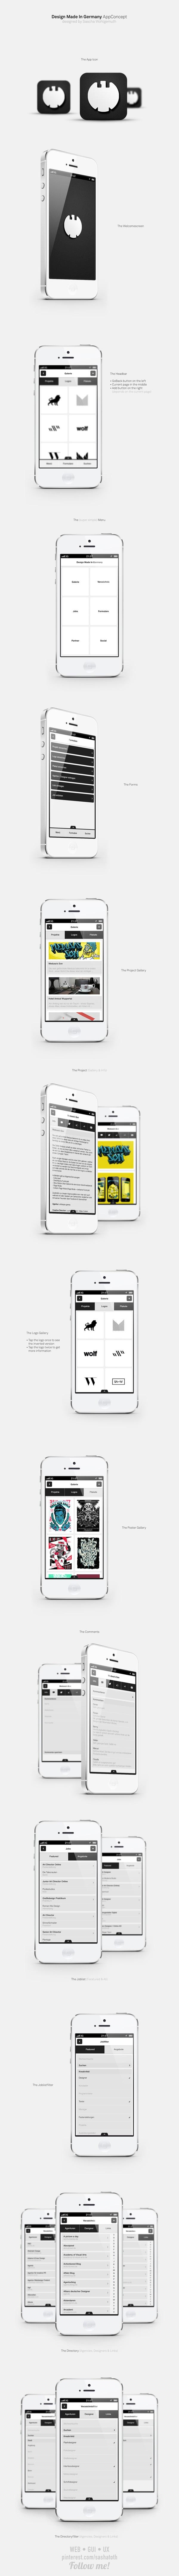 DMIG AppConcept -  Sascha Wohlgemuth, via Behance